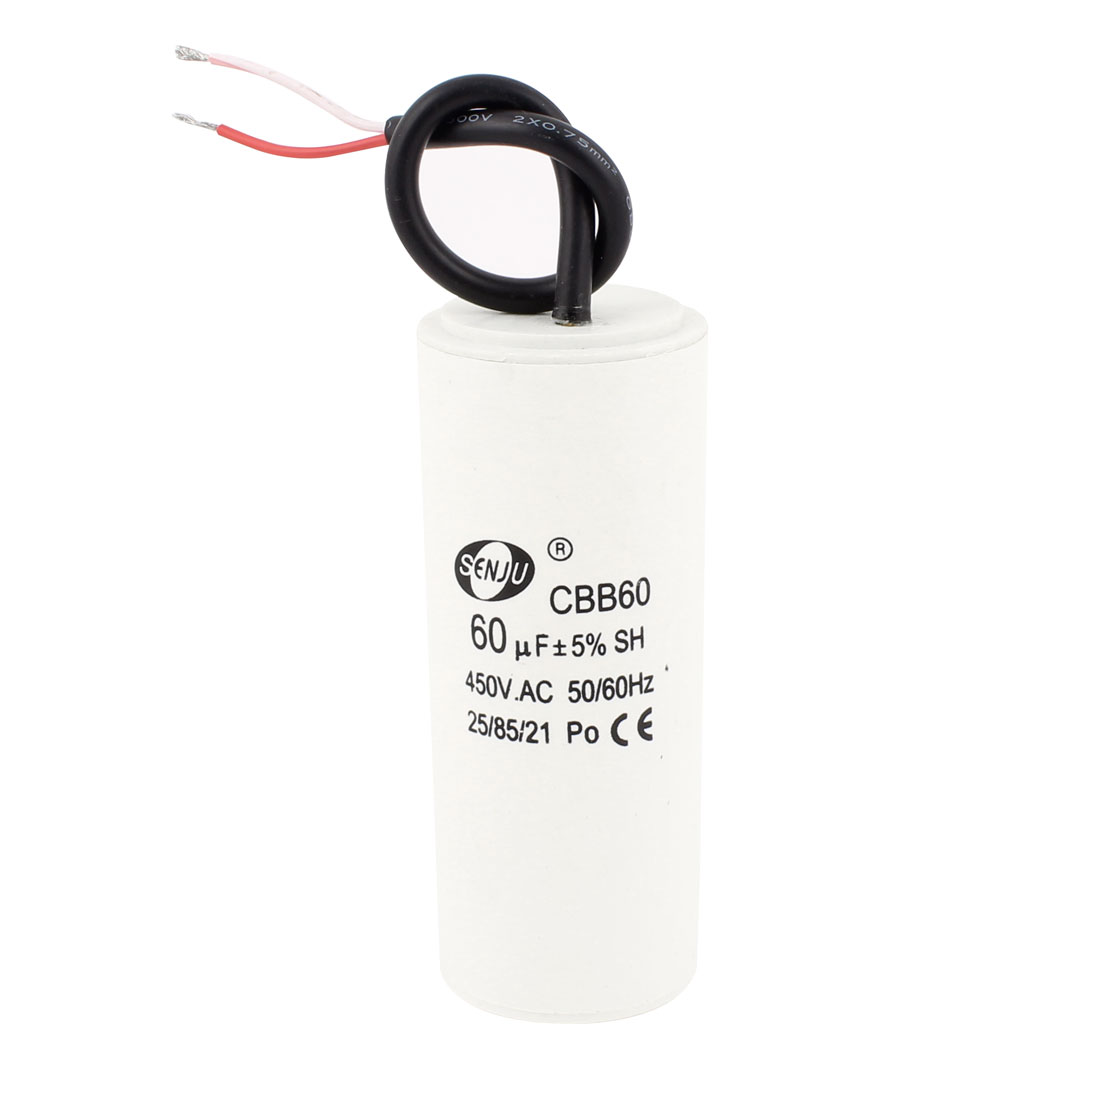 CBB60 50/60Hz Polypropylene Film Motor Running Capacitor AC 450V 60uF 5%